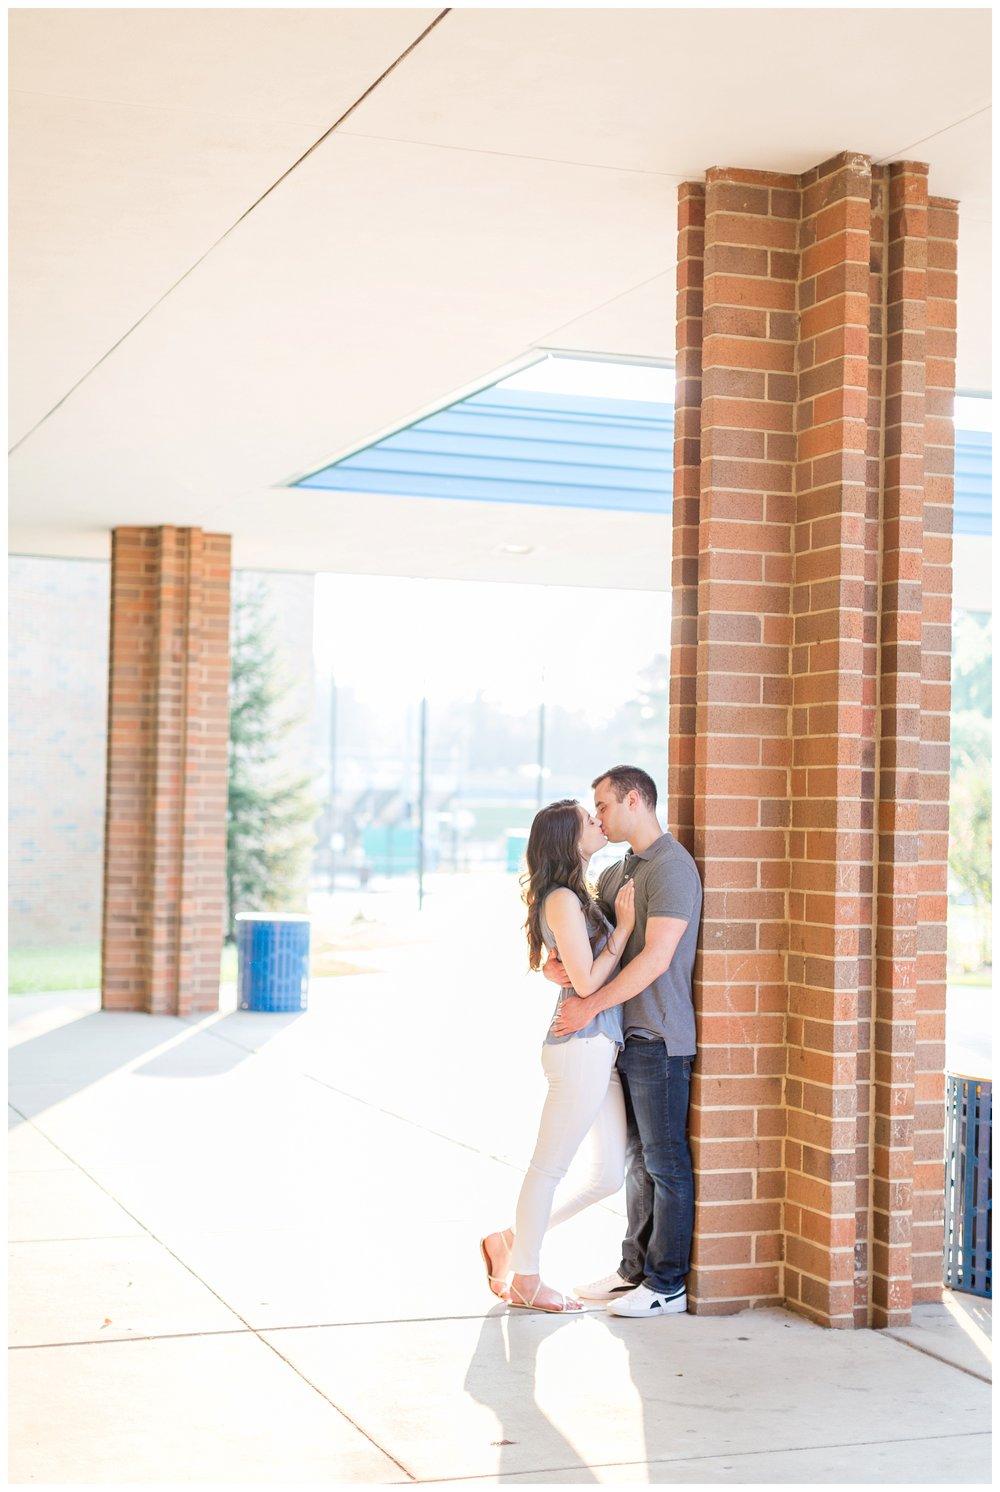 Meadowlark Botanical Garden Engagement | Virginia Wedding Photographer Kir Tuben_0044.jpg